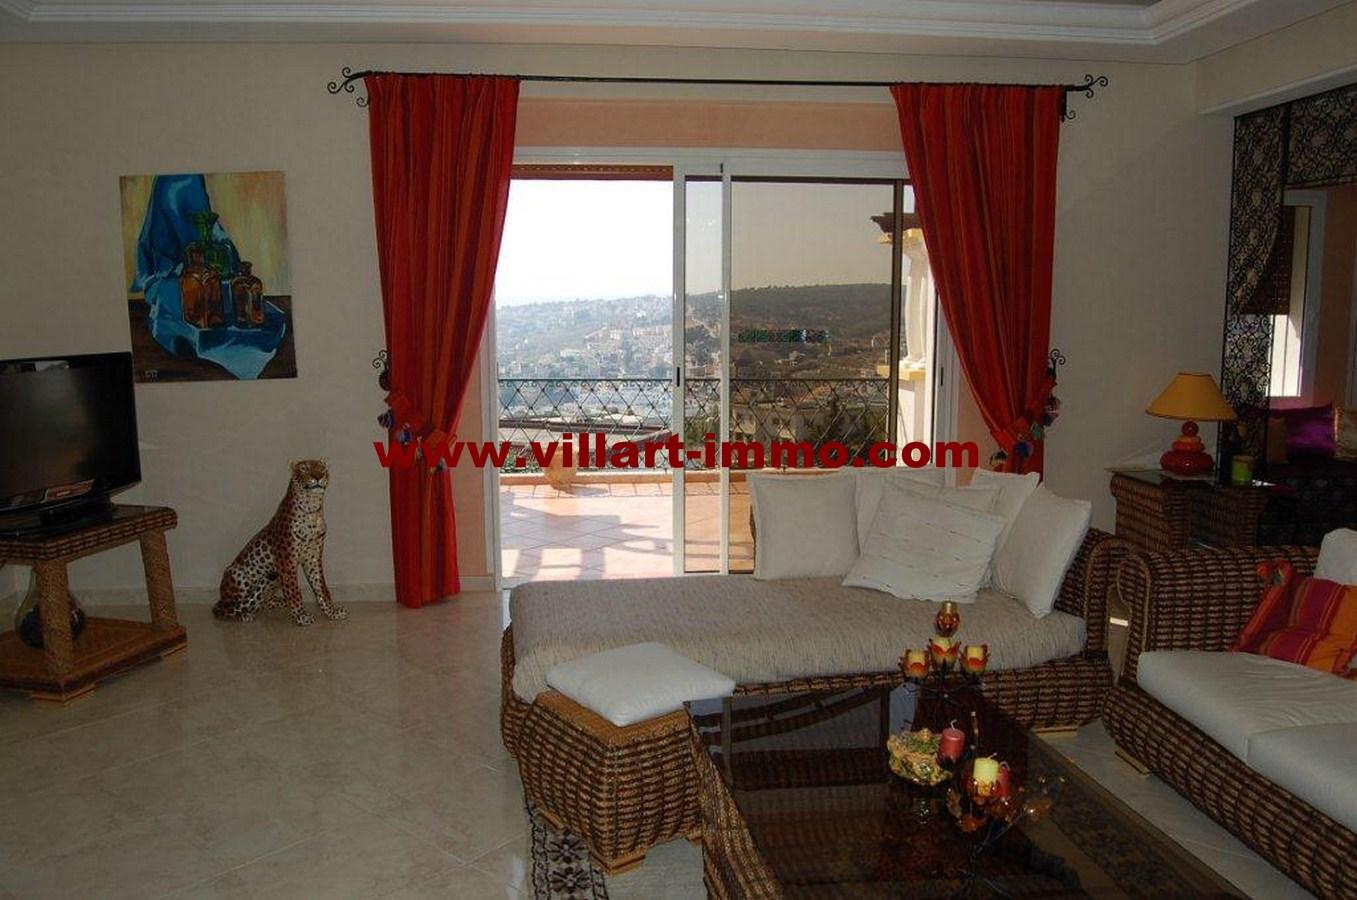 1-vente-appartement-tanger-la-montagne-salon-1-va452-villart-immo